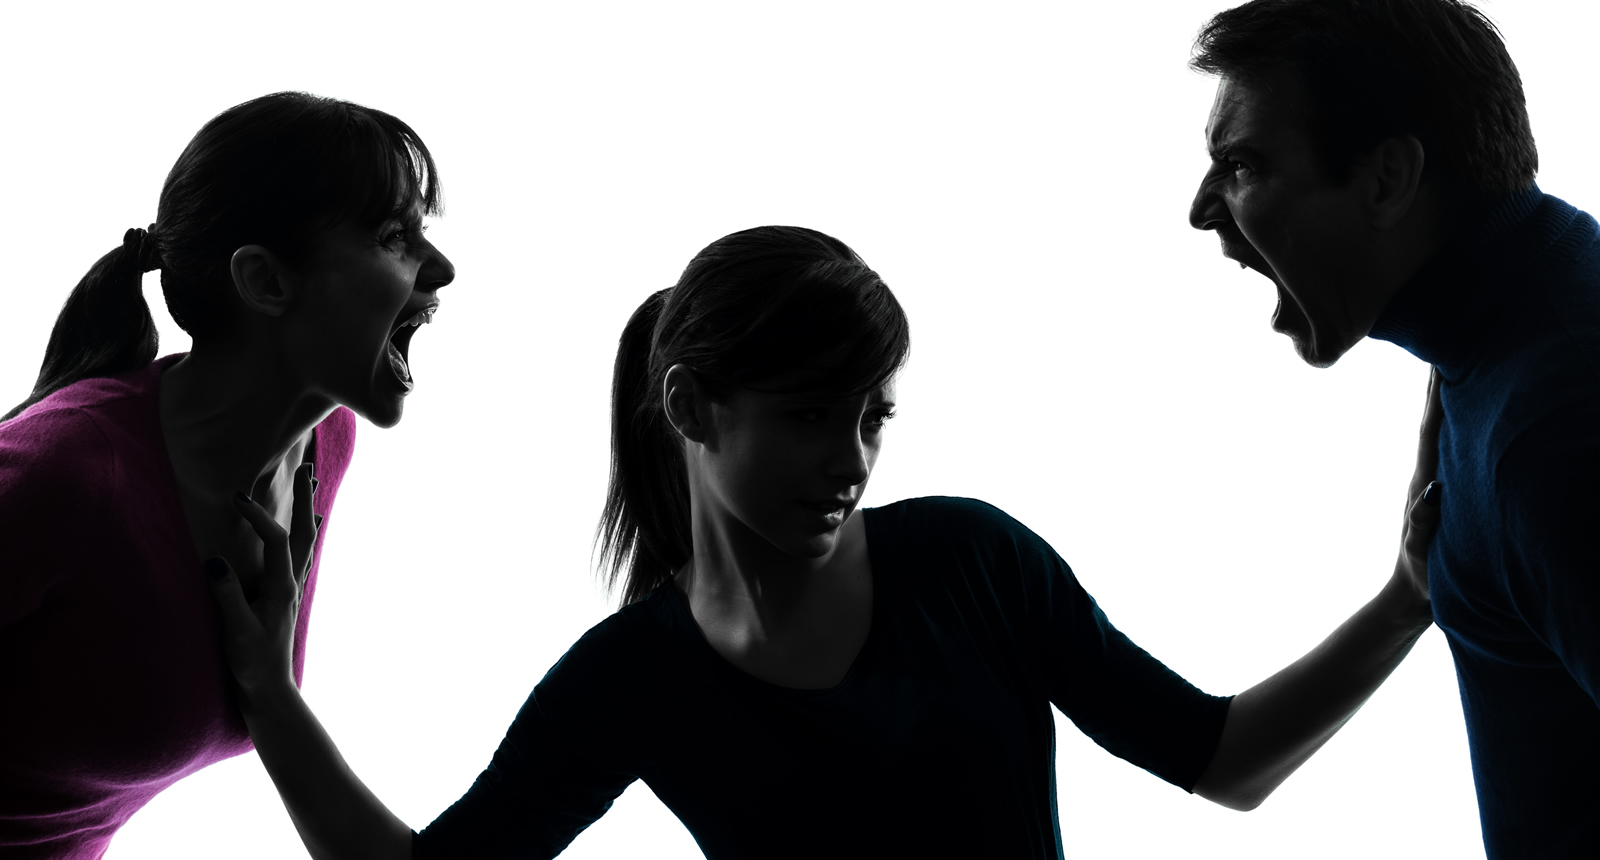 خشونت خانگی غیرقابل انکار - دکتر طباطبایی